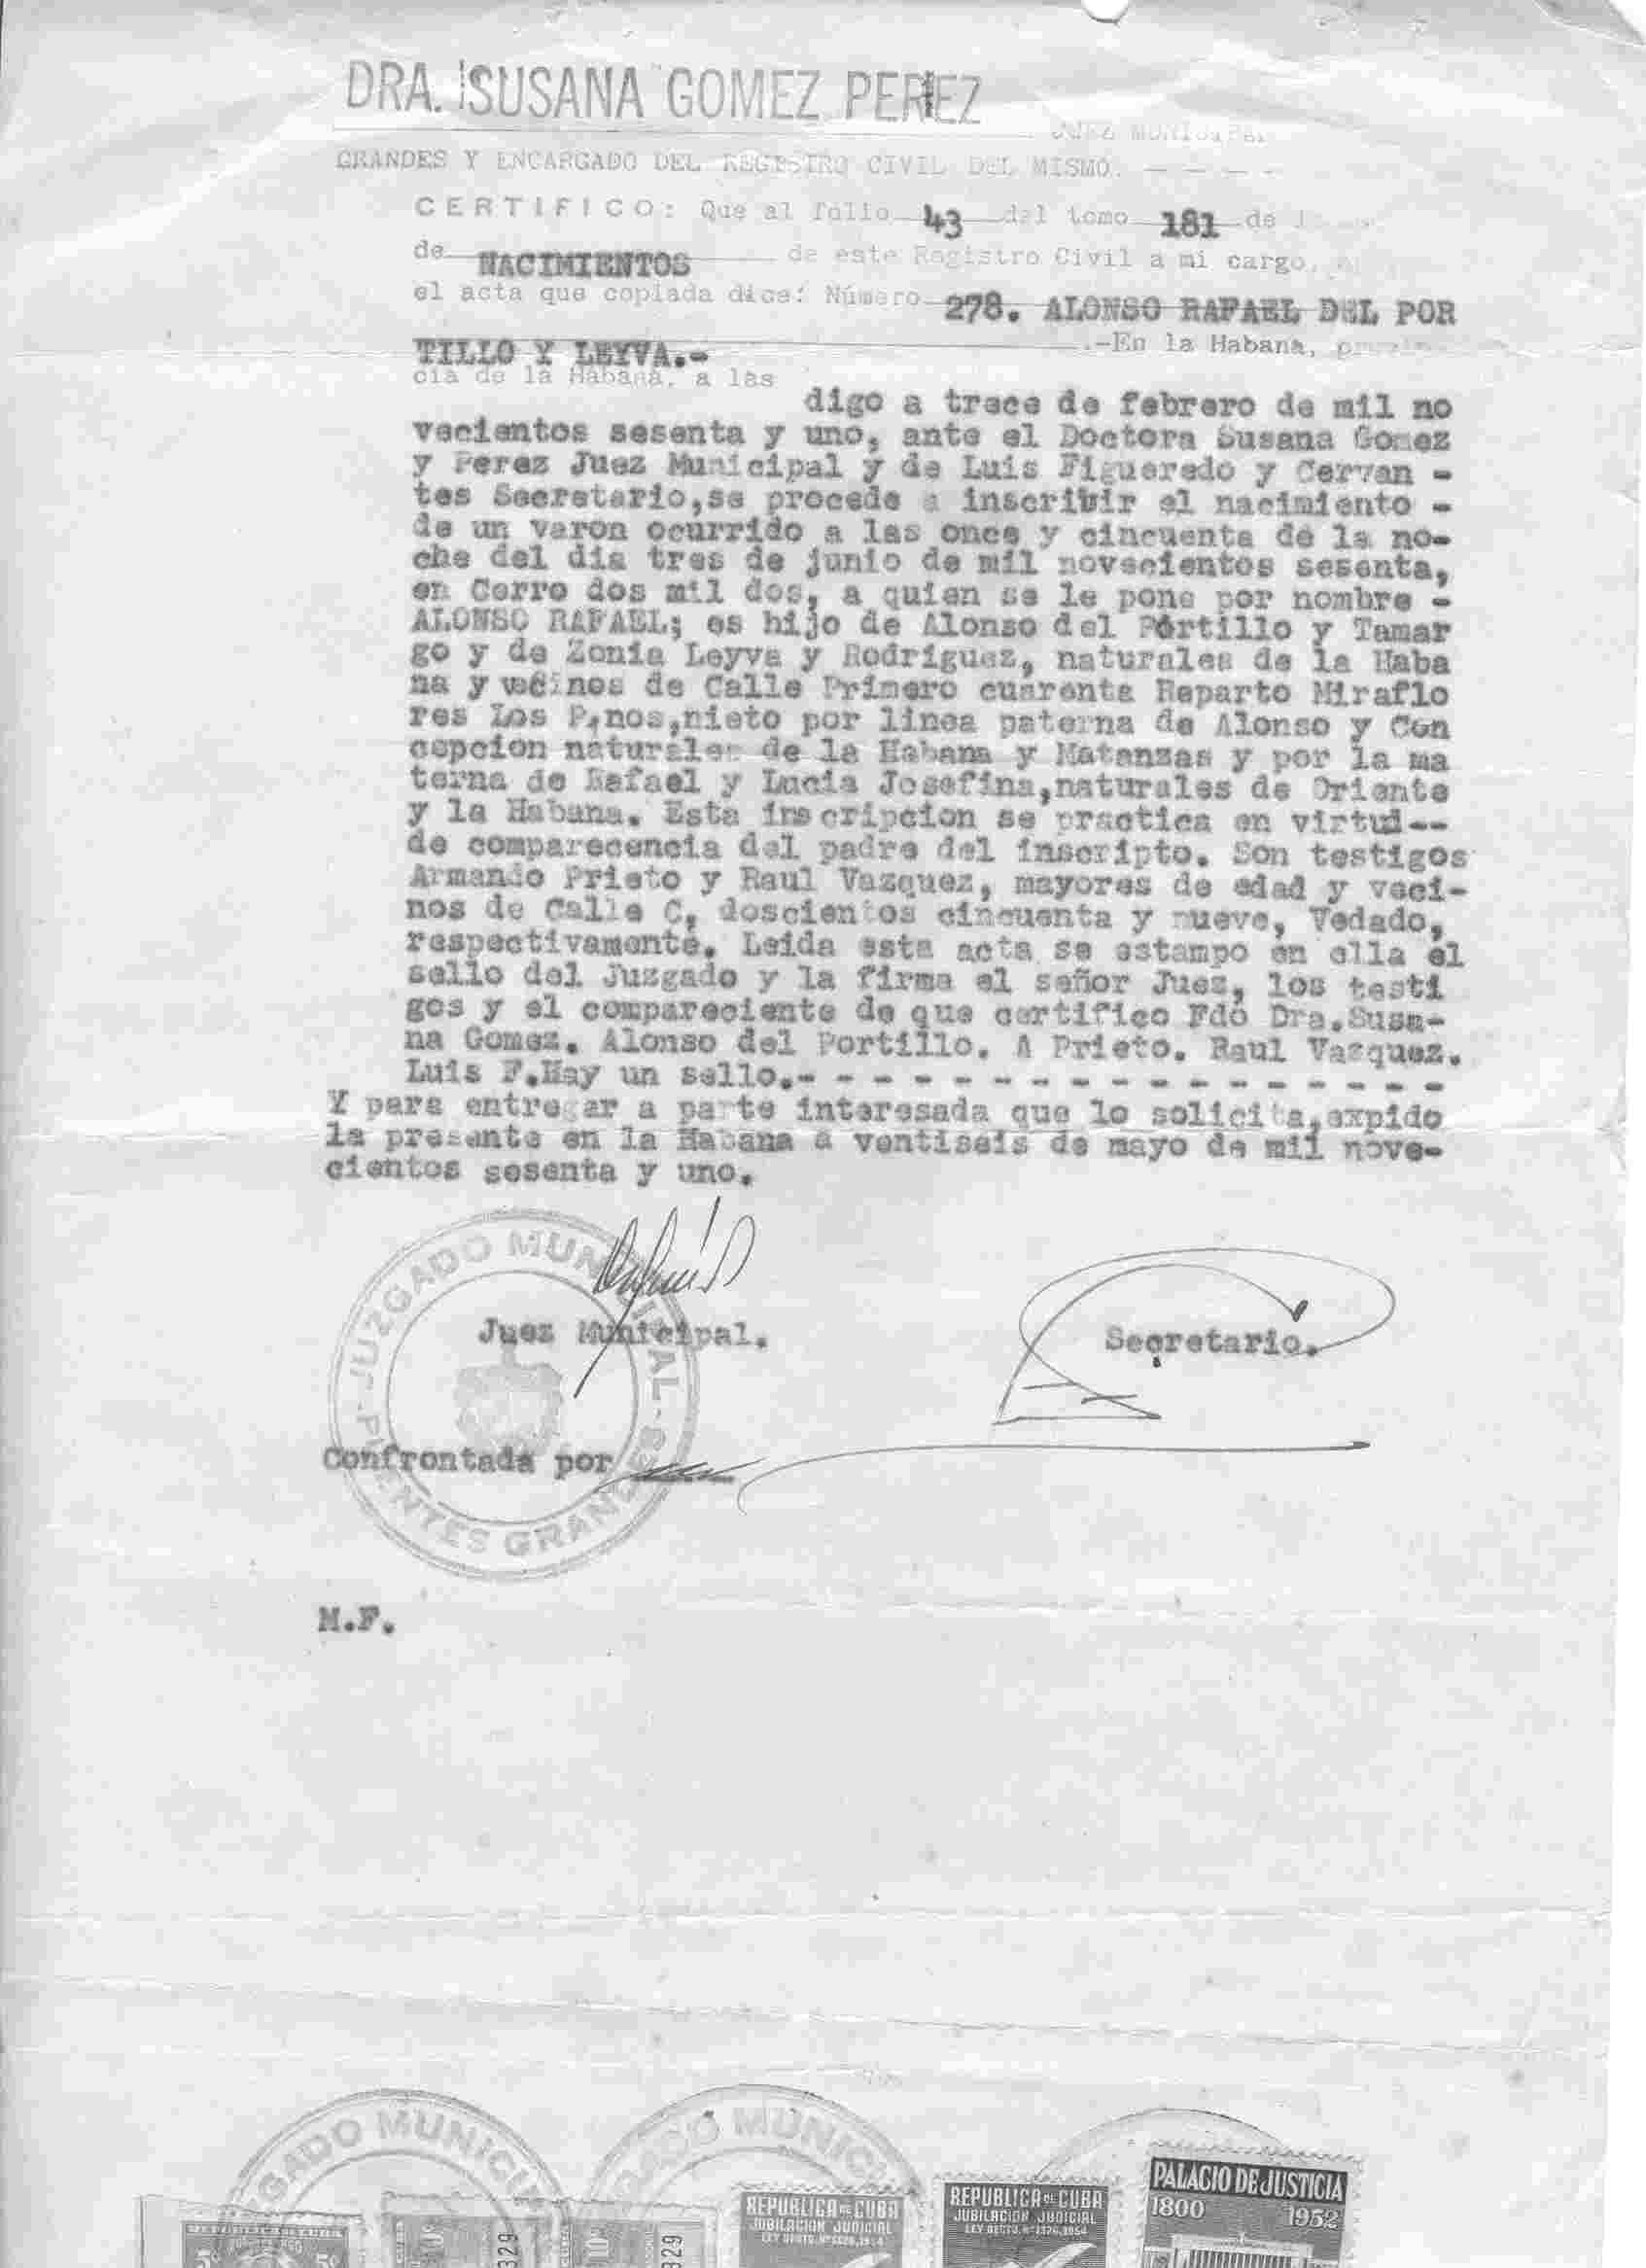 Filealonso r del portillo y leyva cuban birth certificateg filealonso r del portillo y leyva cuban birth certificateg aiddatafo Images